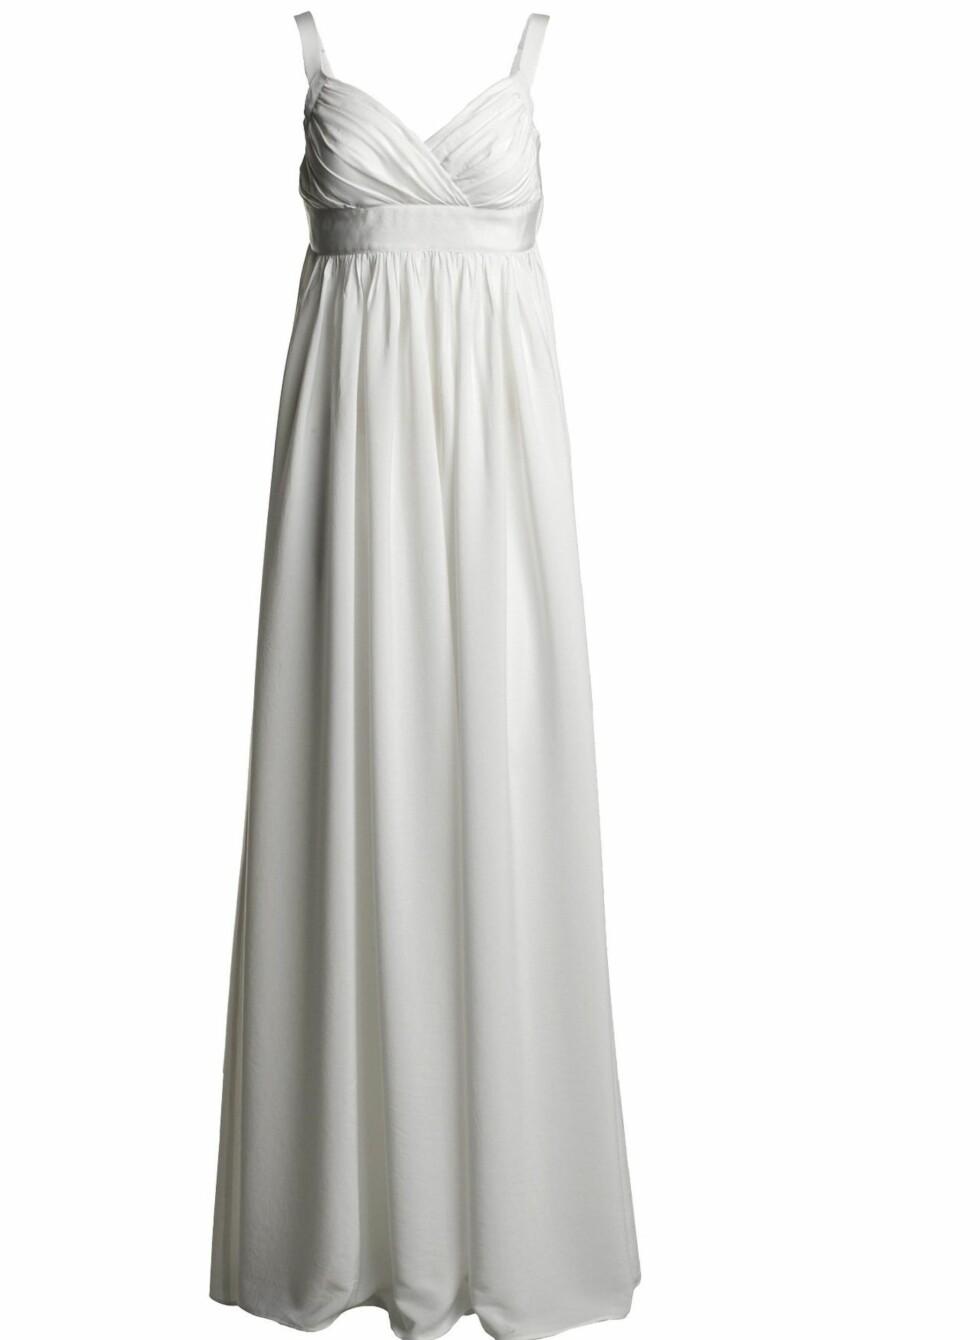 Lang kjole med draperier (kr 700, Lindex). Foto: temporary2